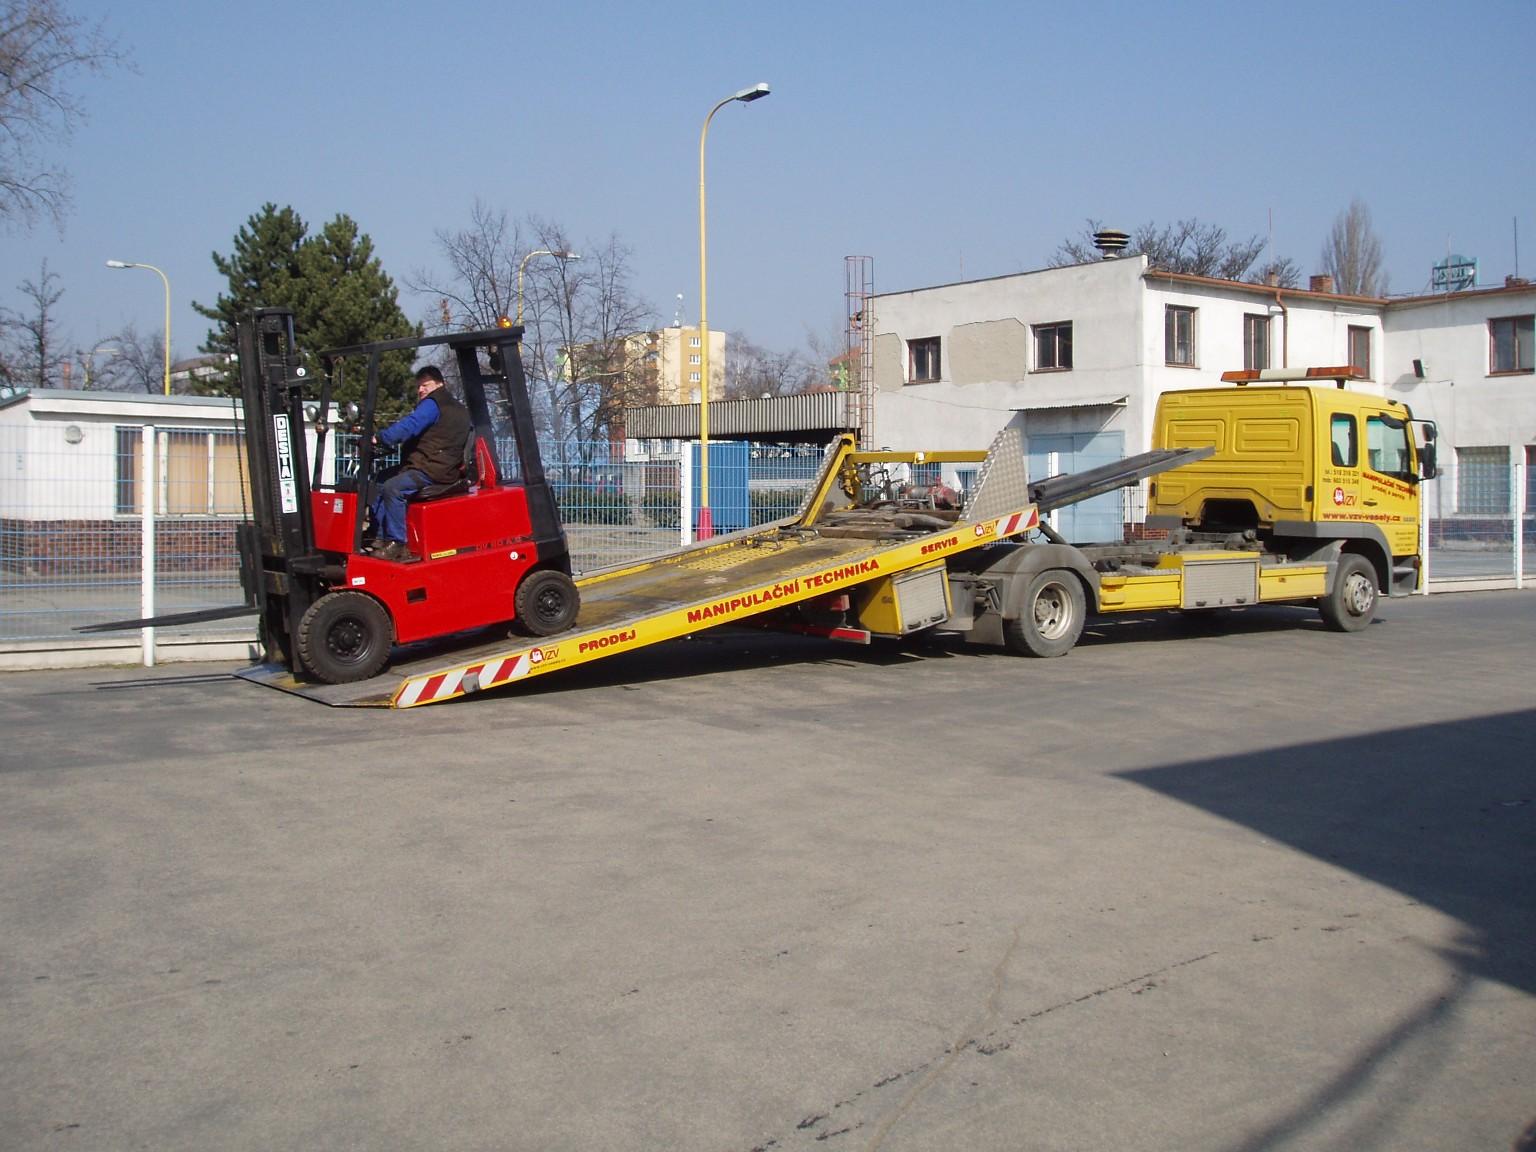 Odtahová služba pro vysokozdvižné vozíky, manipulační techniku a motorová vozidla